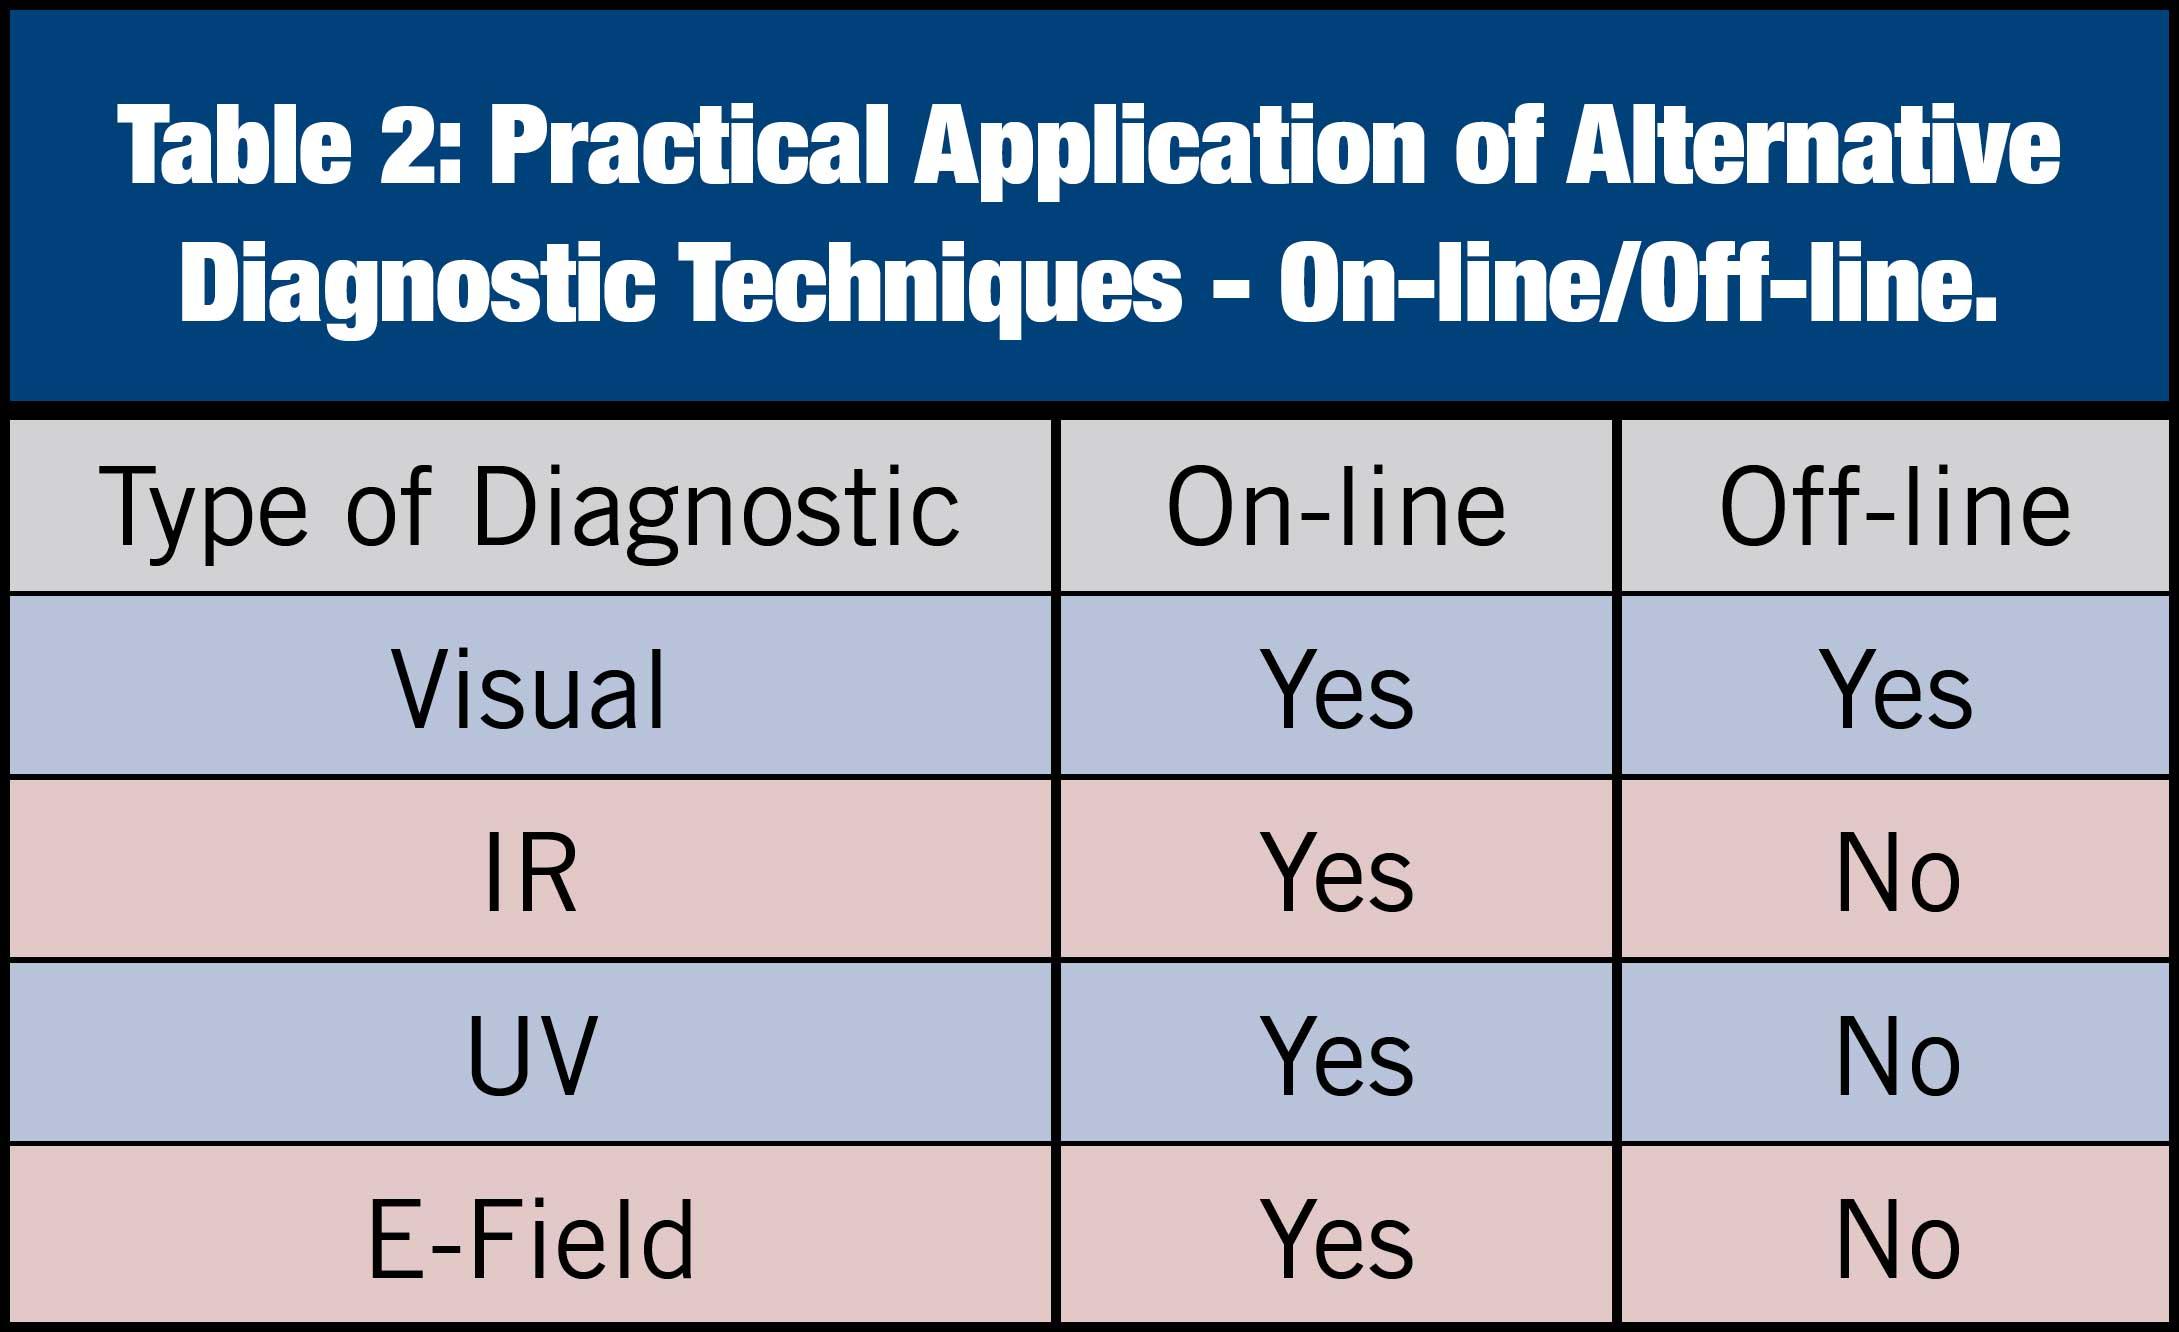 composite insulator Comparison of Methodologies to Detect Damaged Composite Insulators Practical Application of Alternative